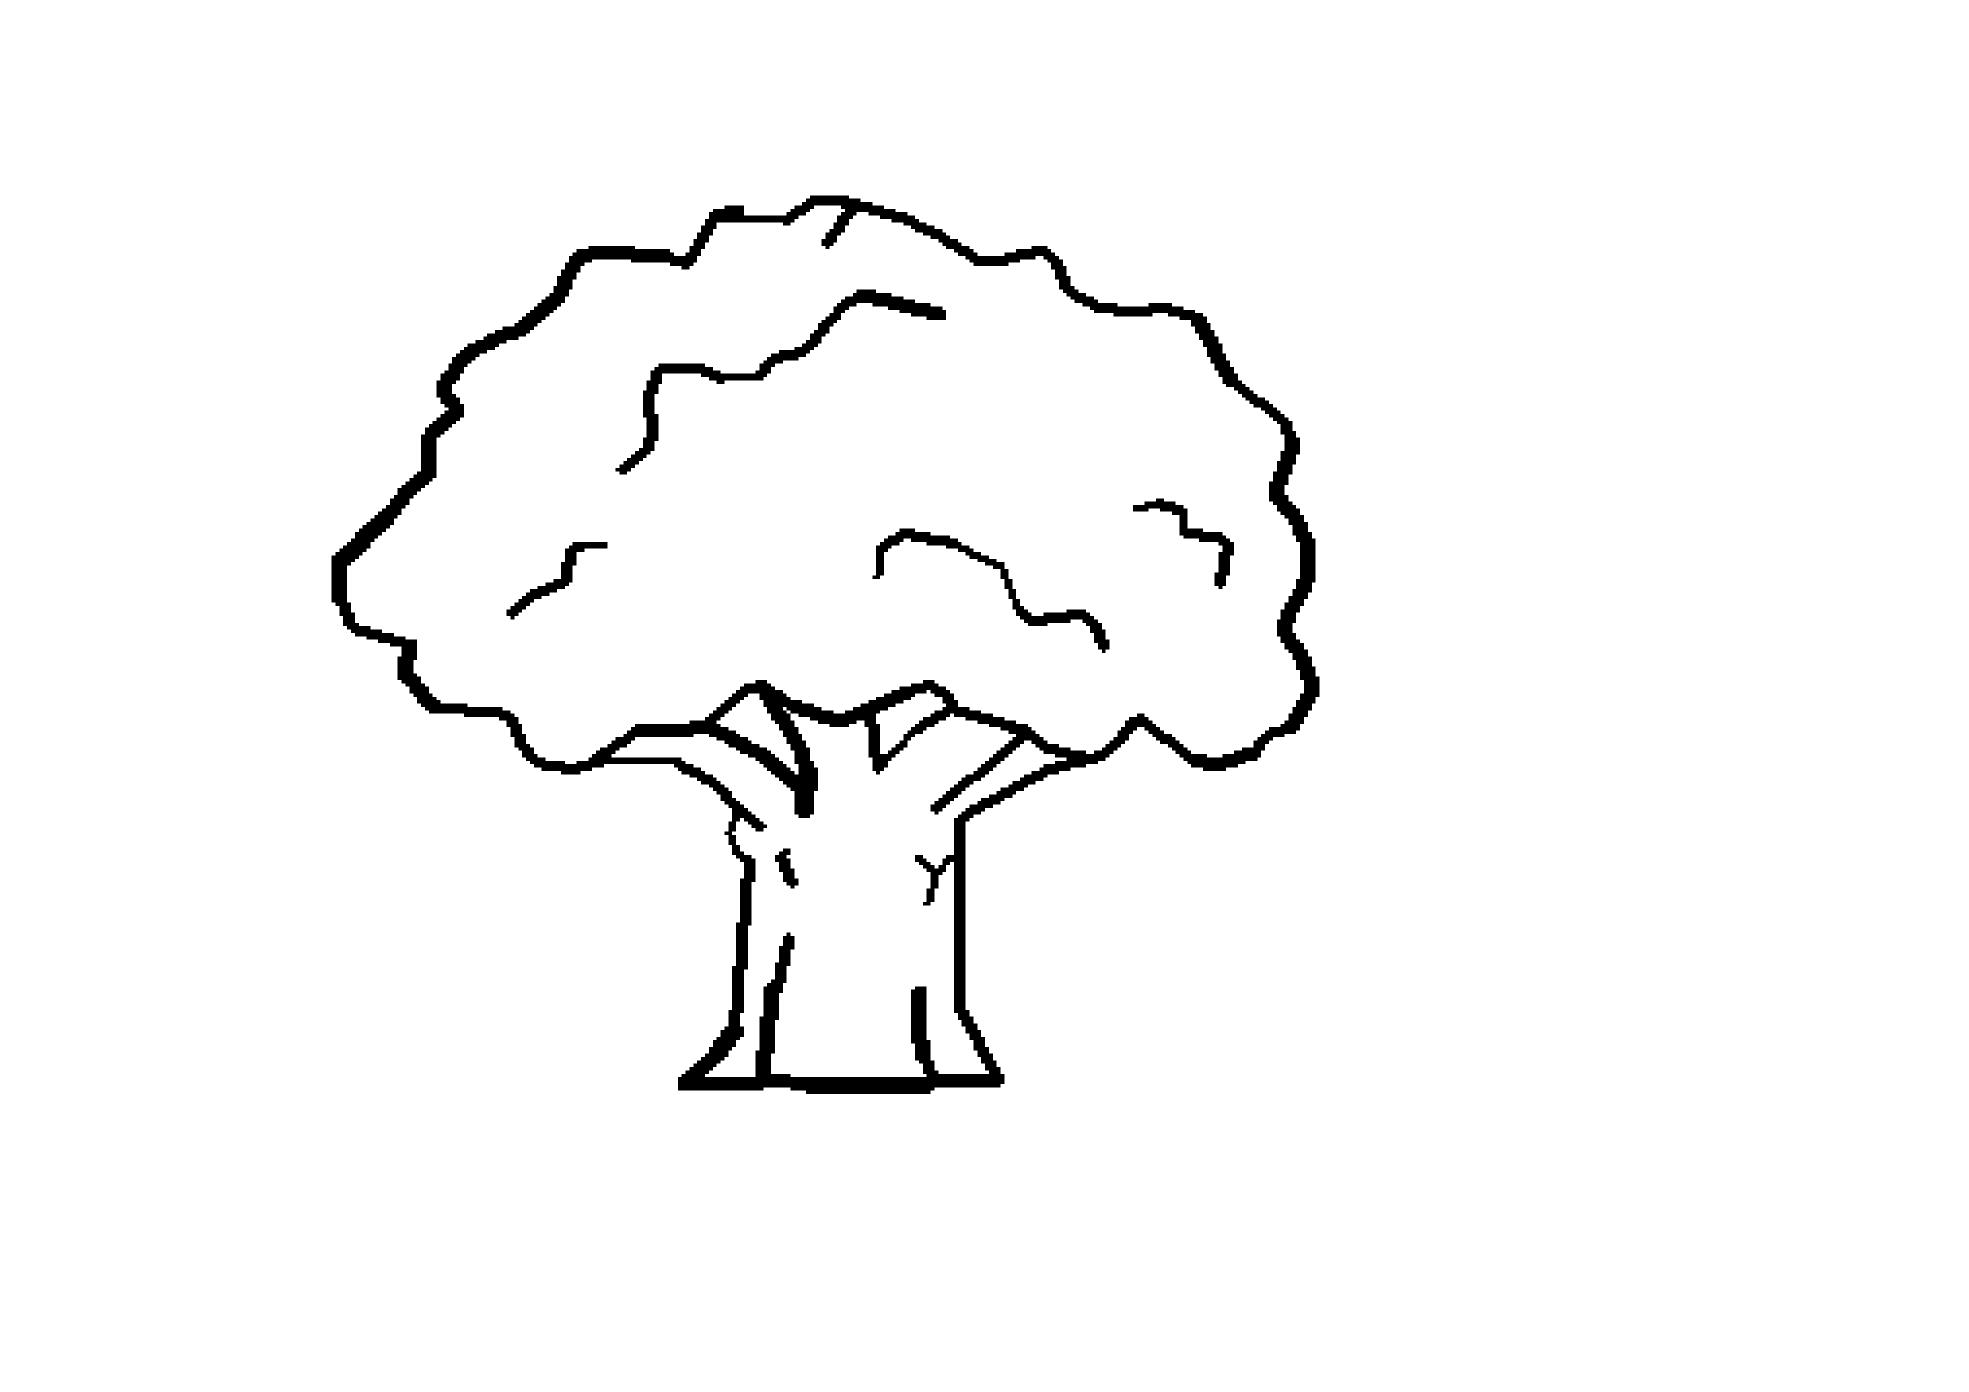 Clipart mango tree black and white